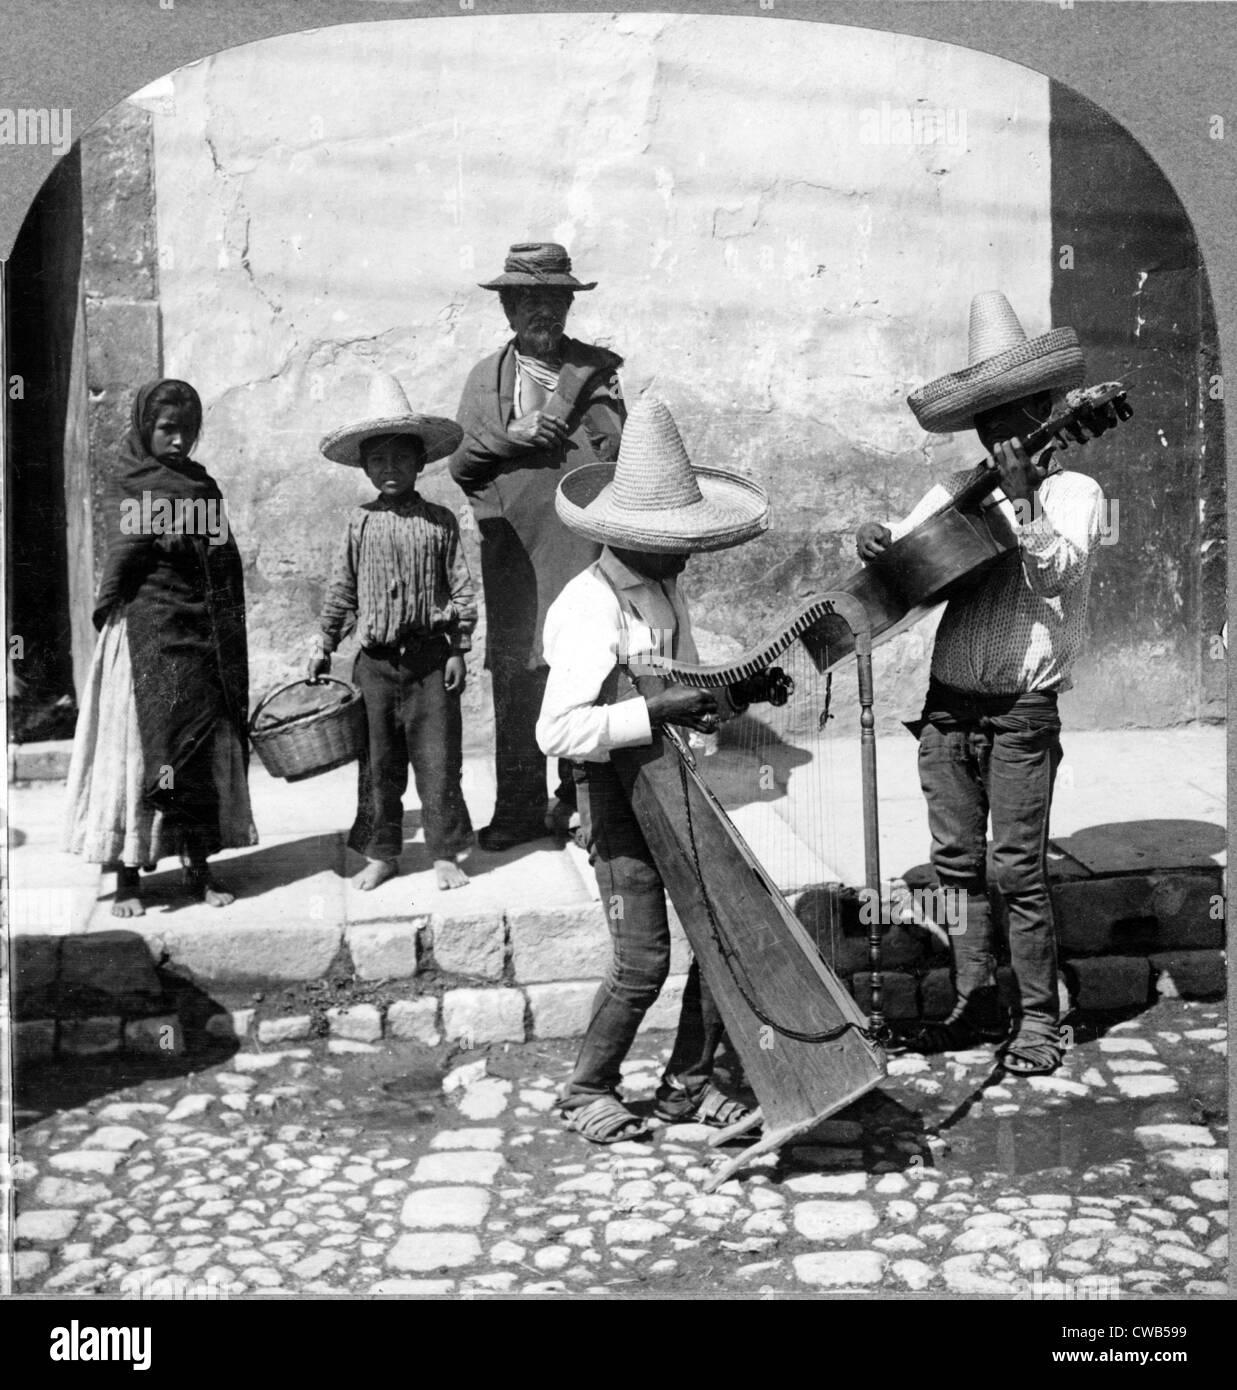 La musique folk. Des musiciens de rue, Guanajuato, Mexique, 1906 Photo Stock